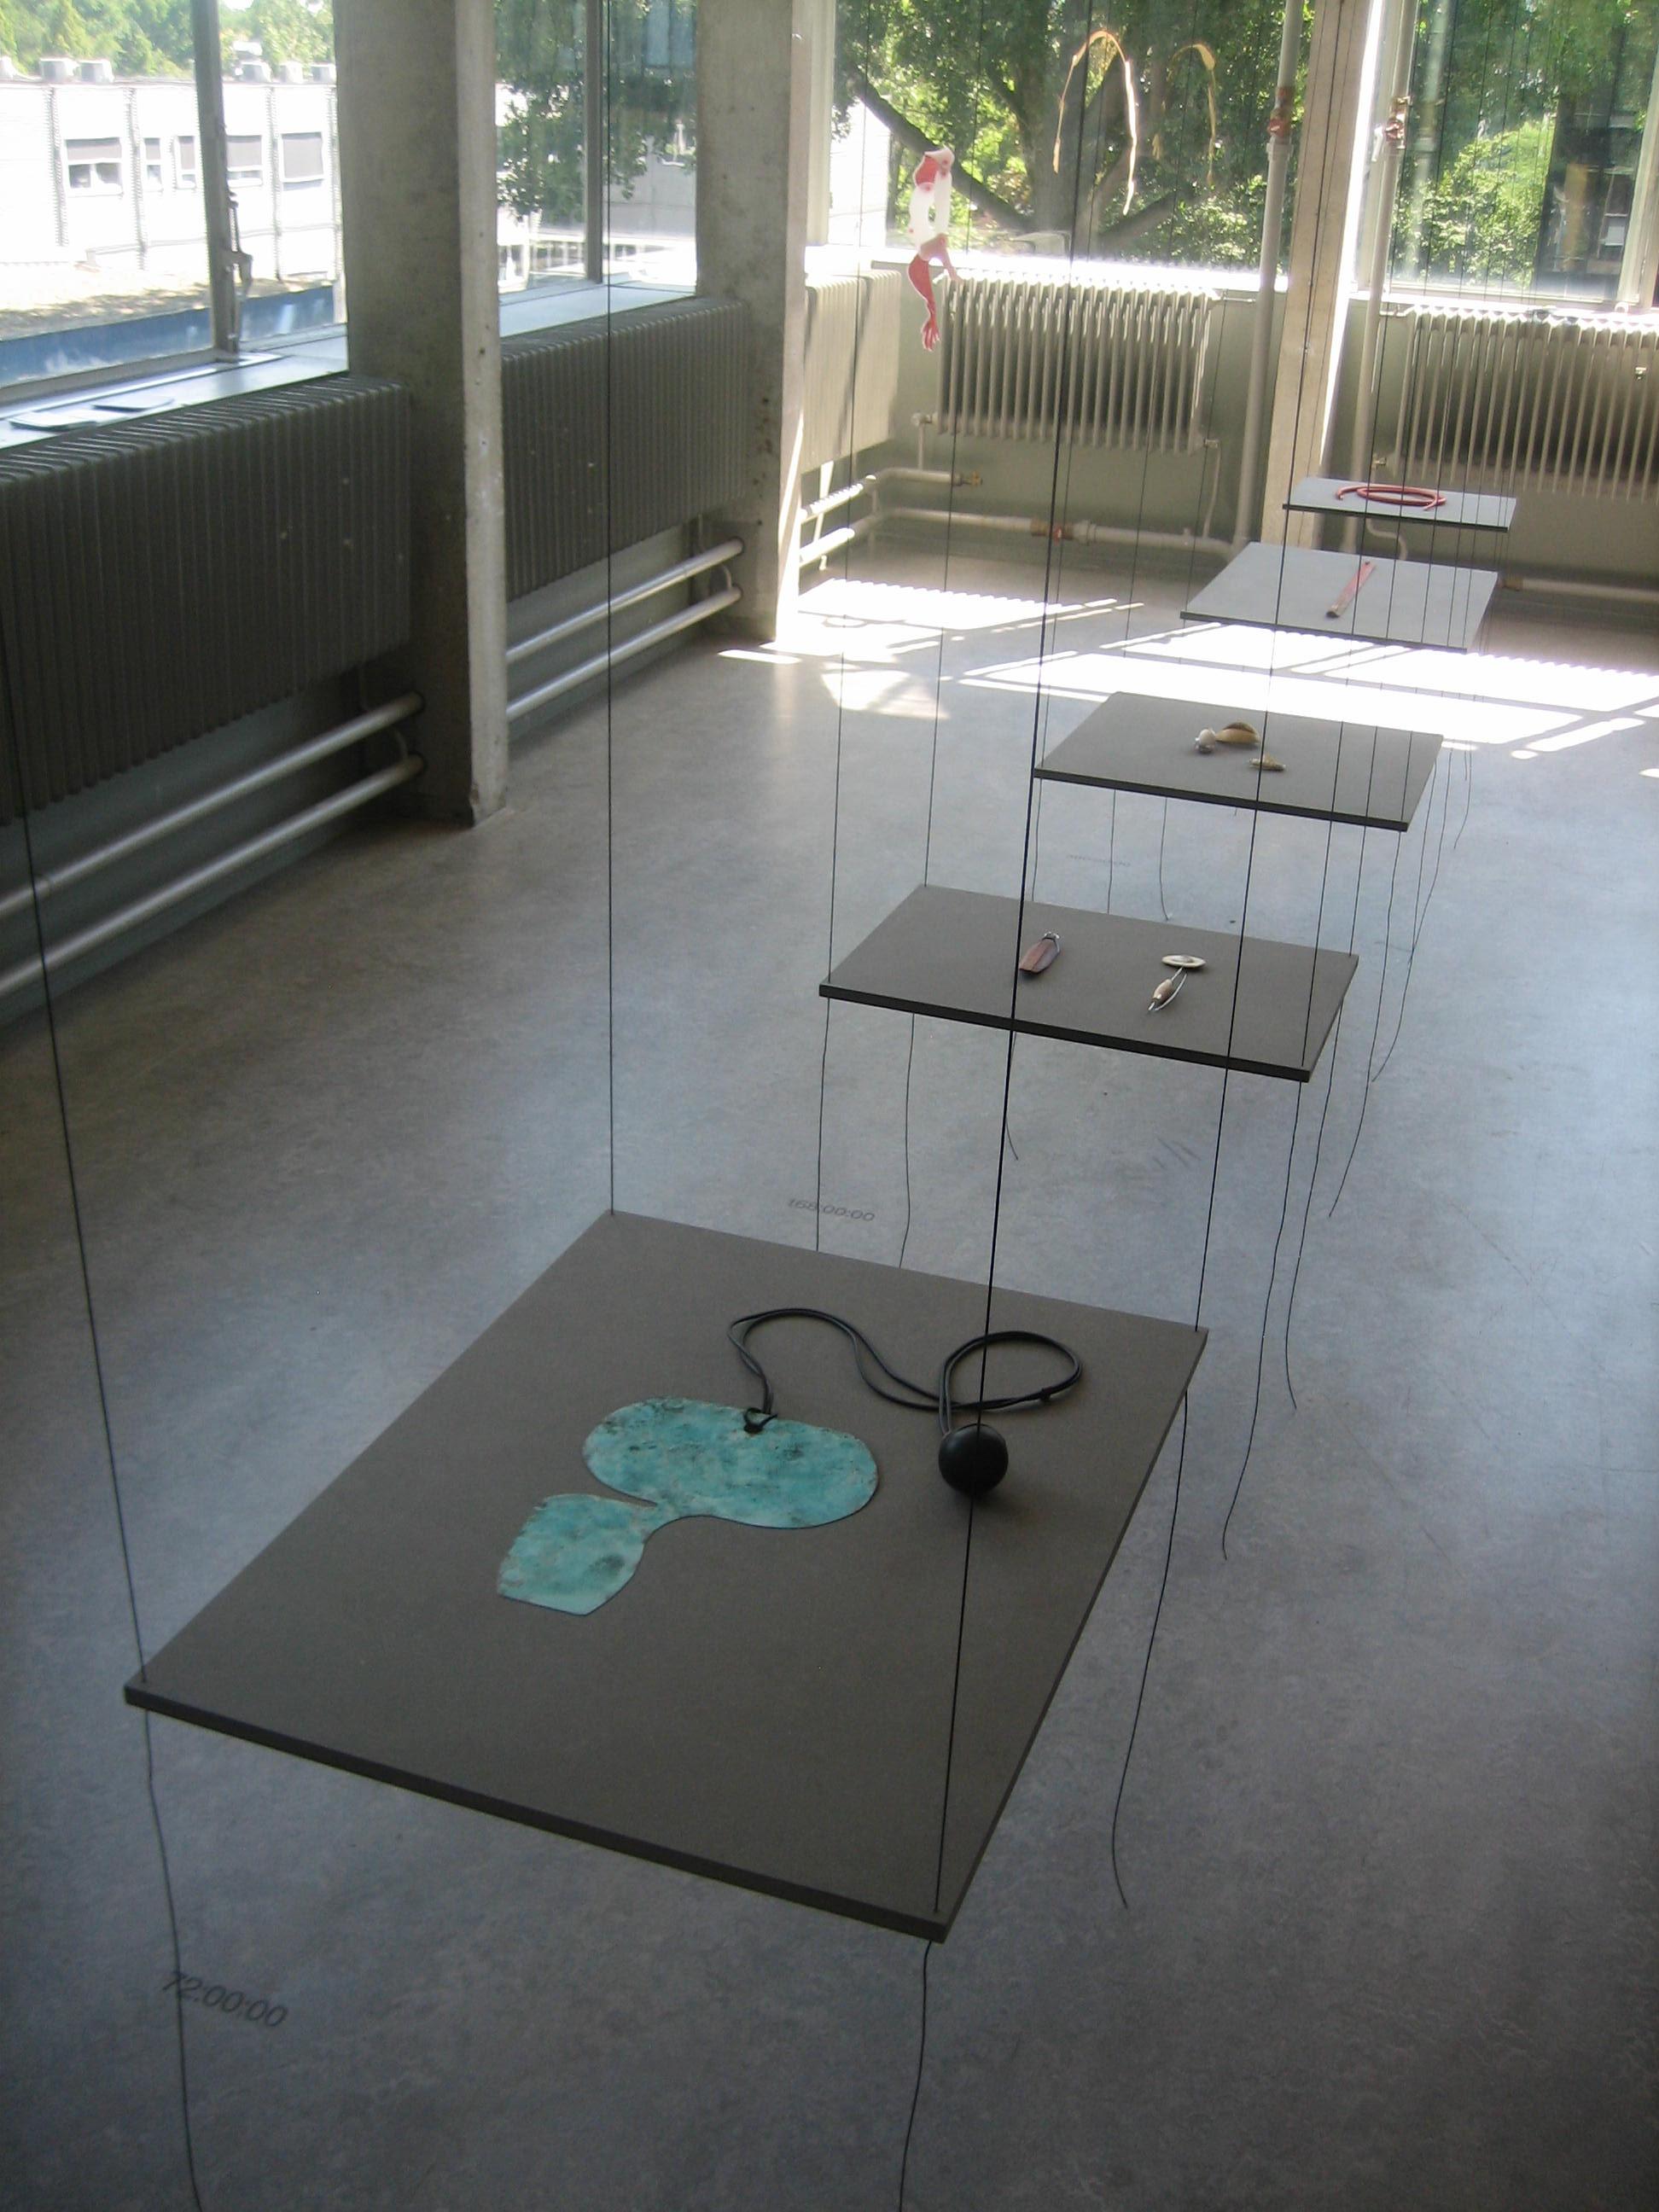 Graduation Show, Gerrit Rietveld Academie. Foto Esther Doornbusch, juli 2018, CC BY 4.0